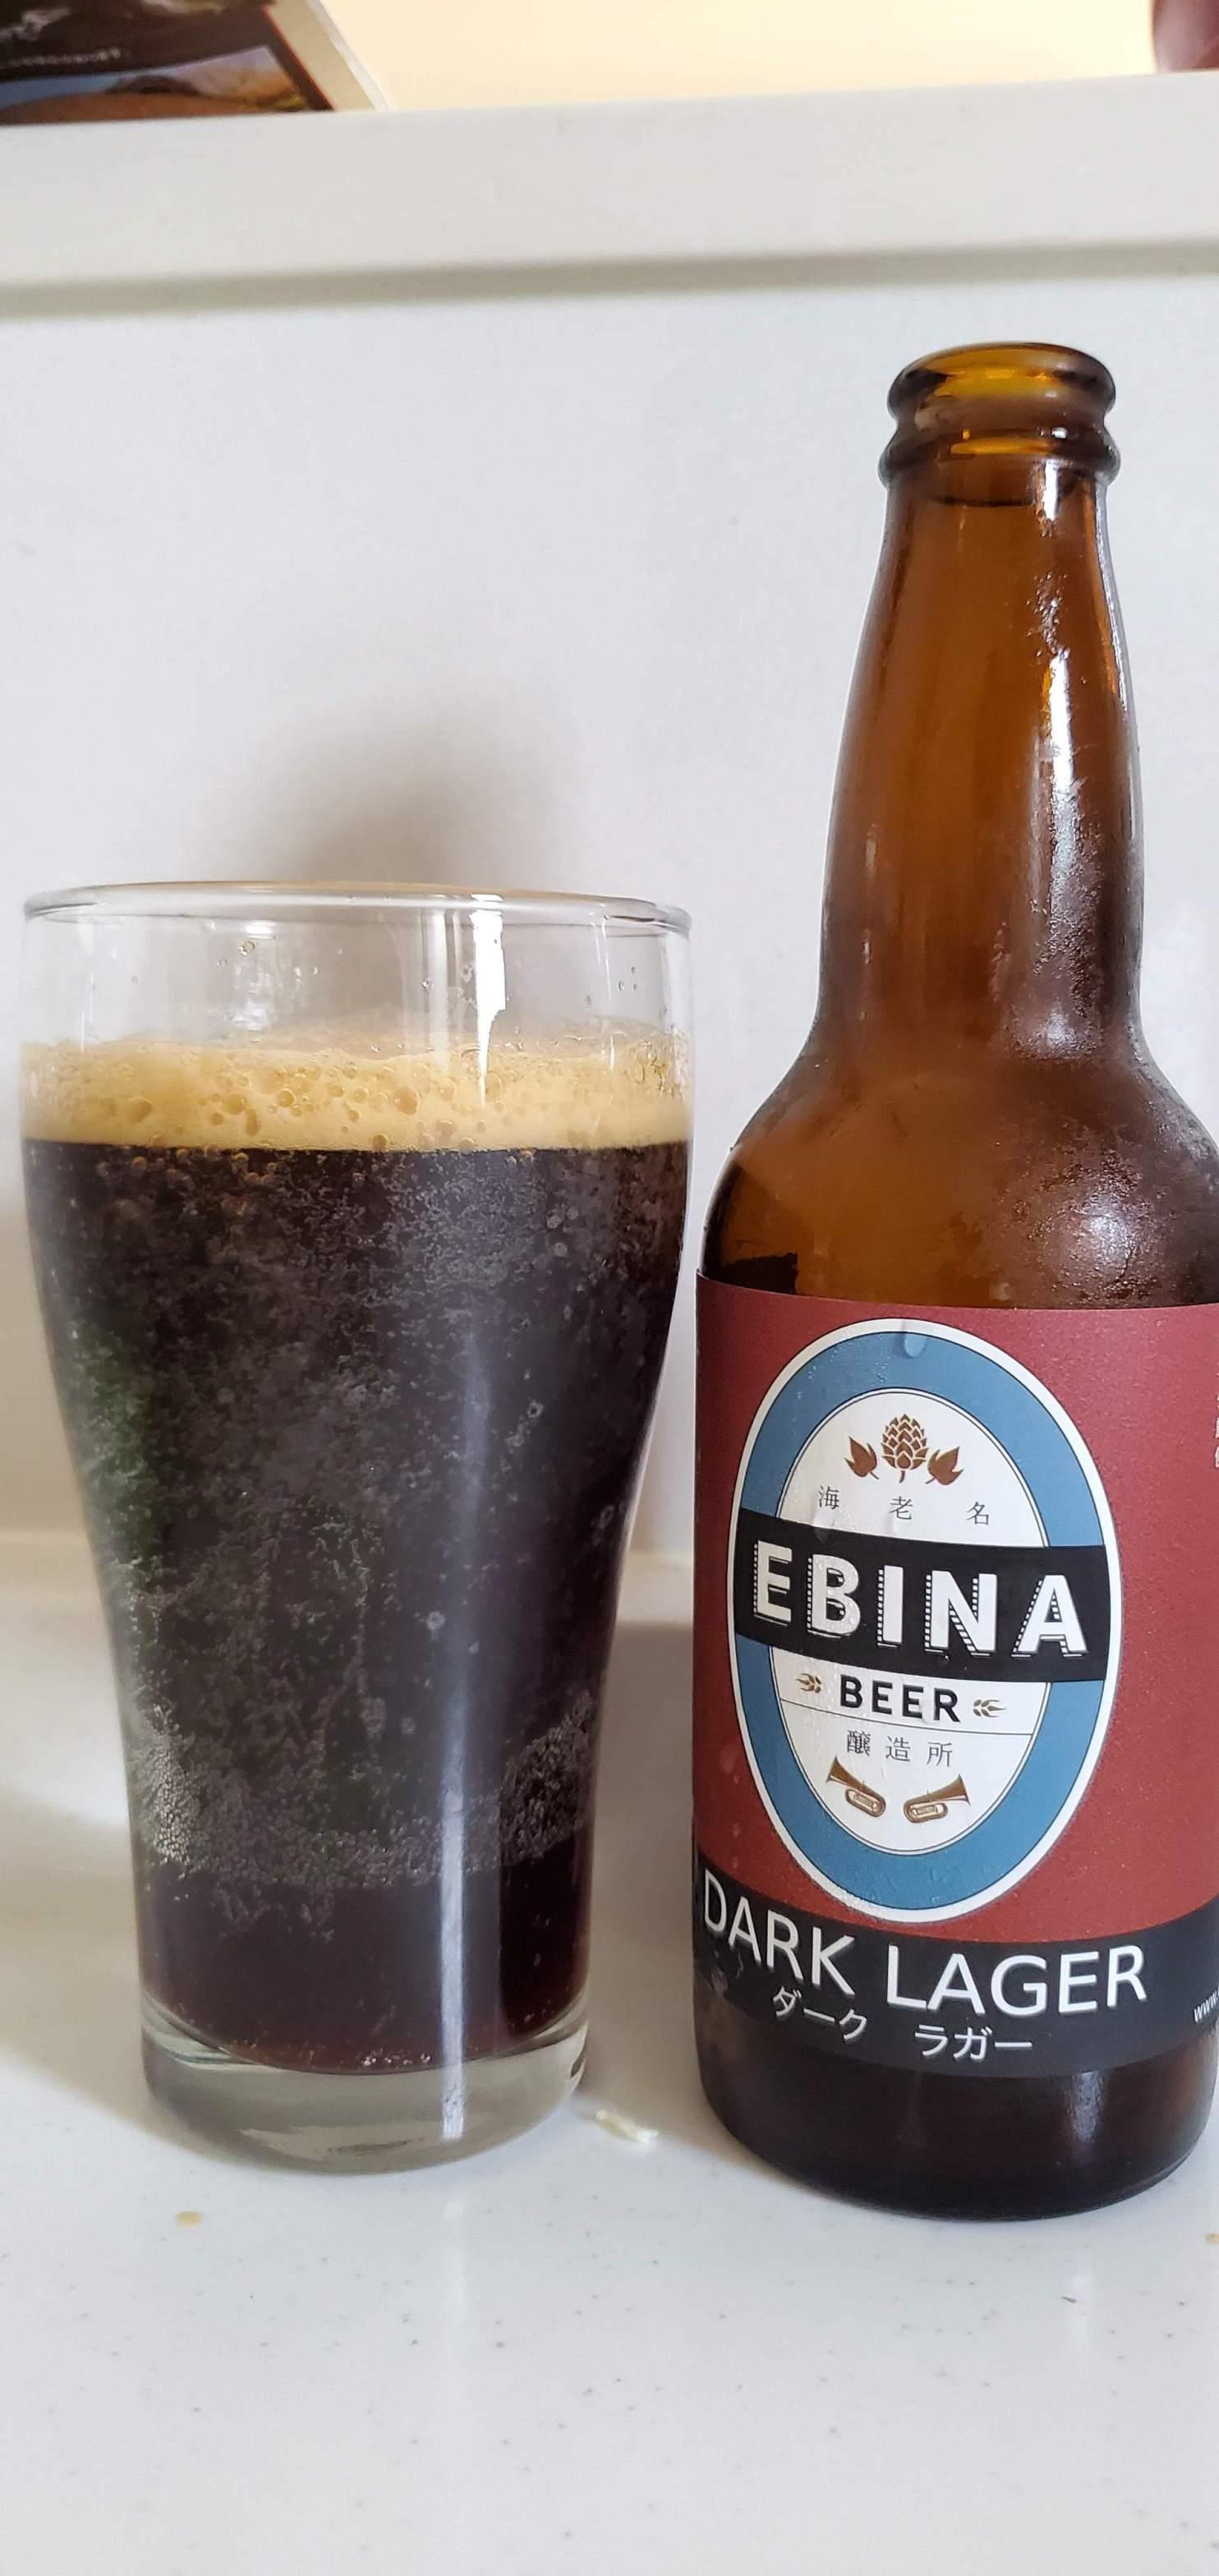 Ebina Dark Lager・エビナダークラガー